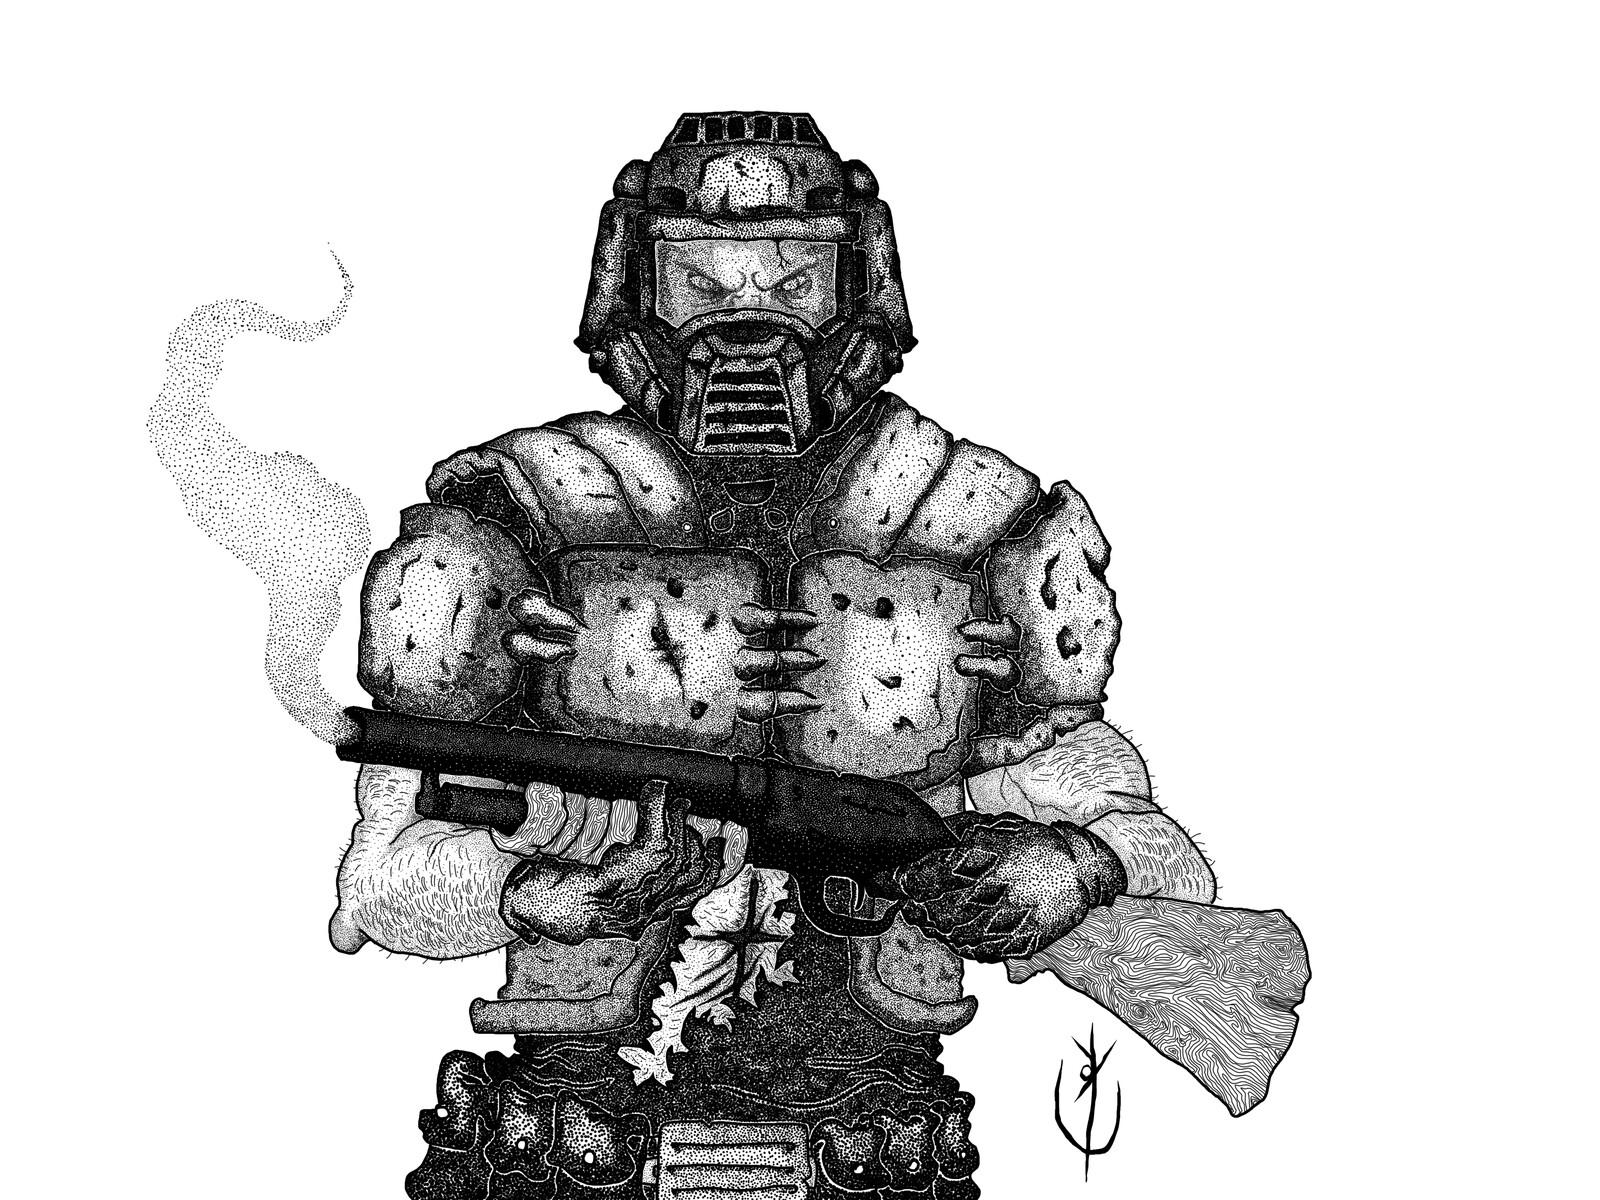 Doomguy ou Slayer sem cor